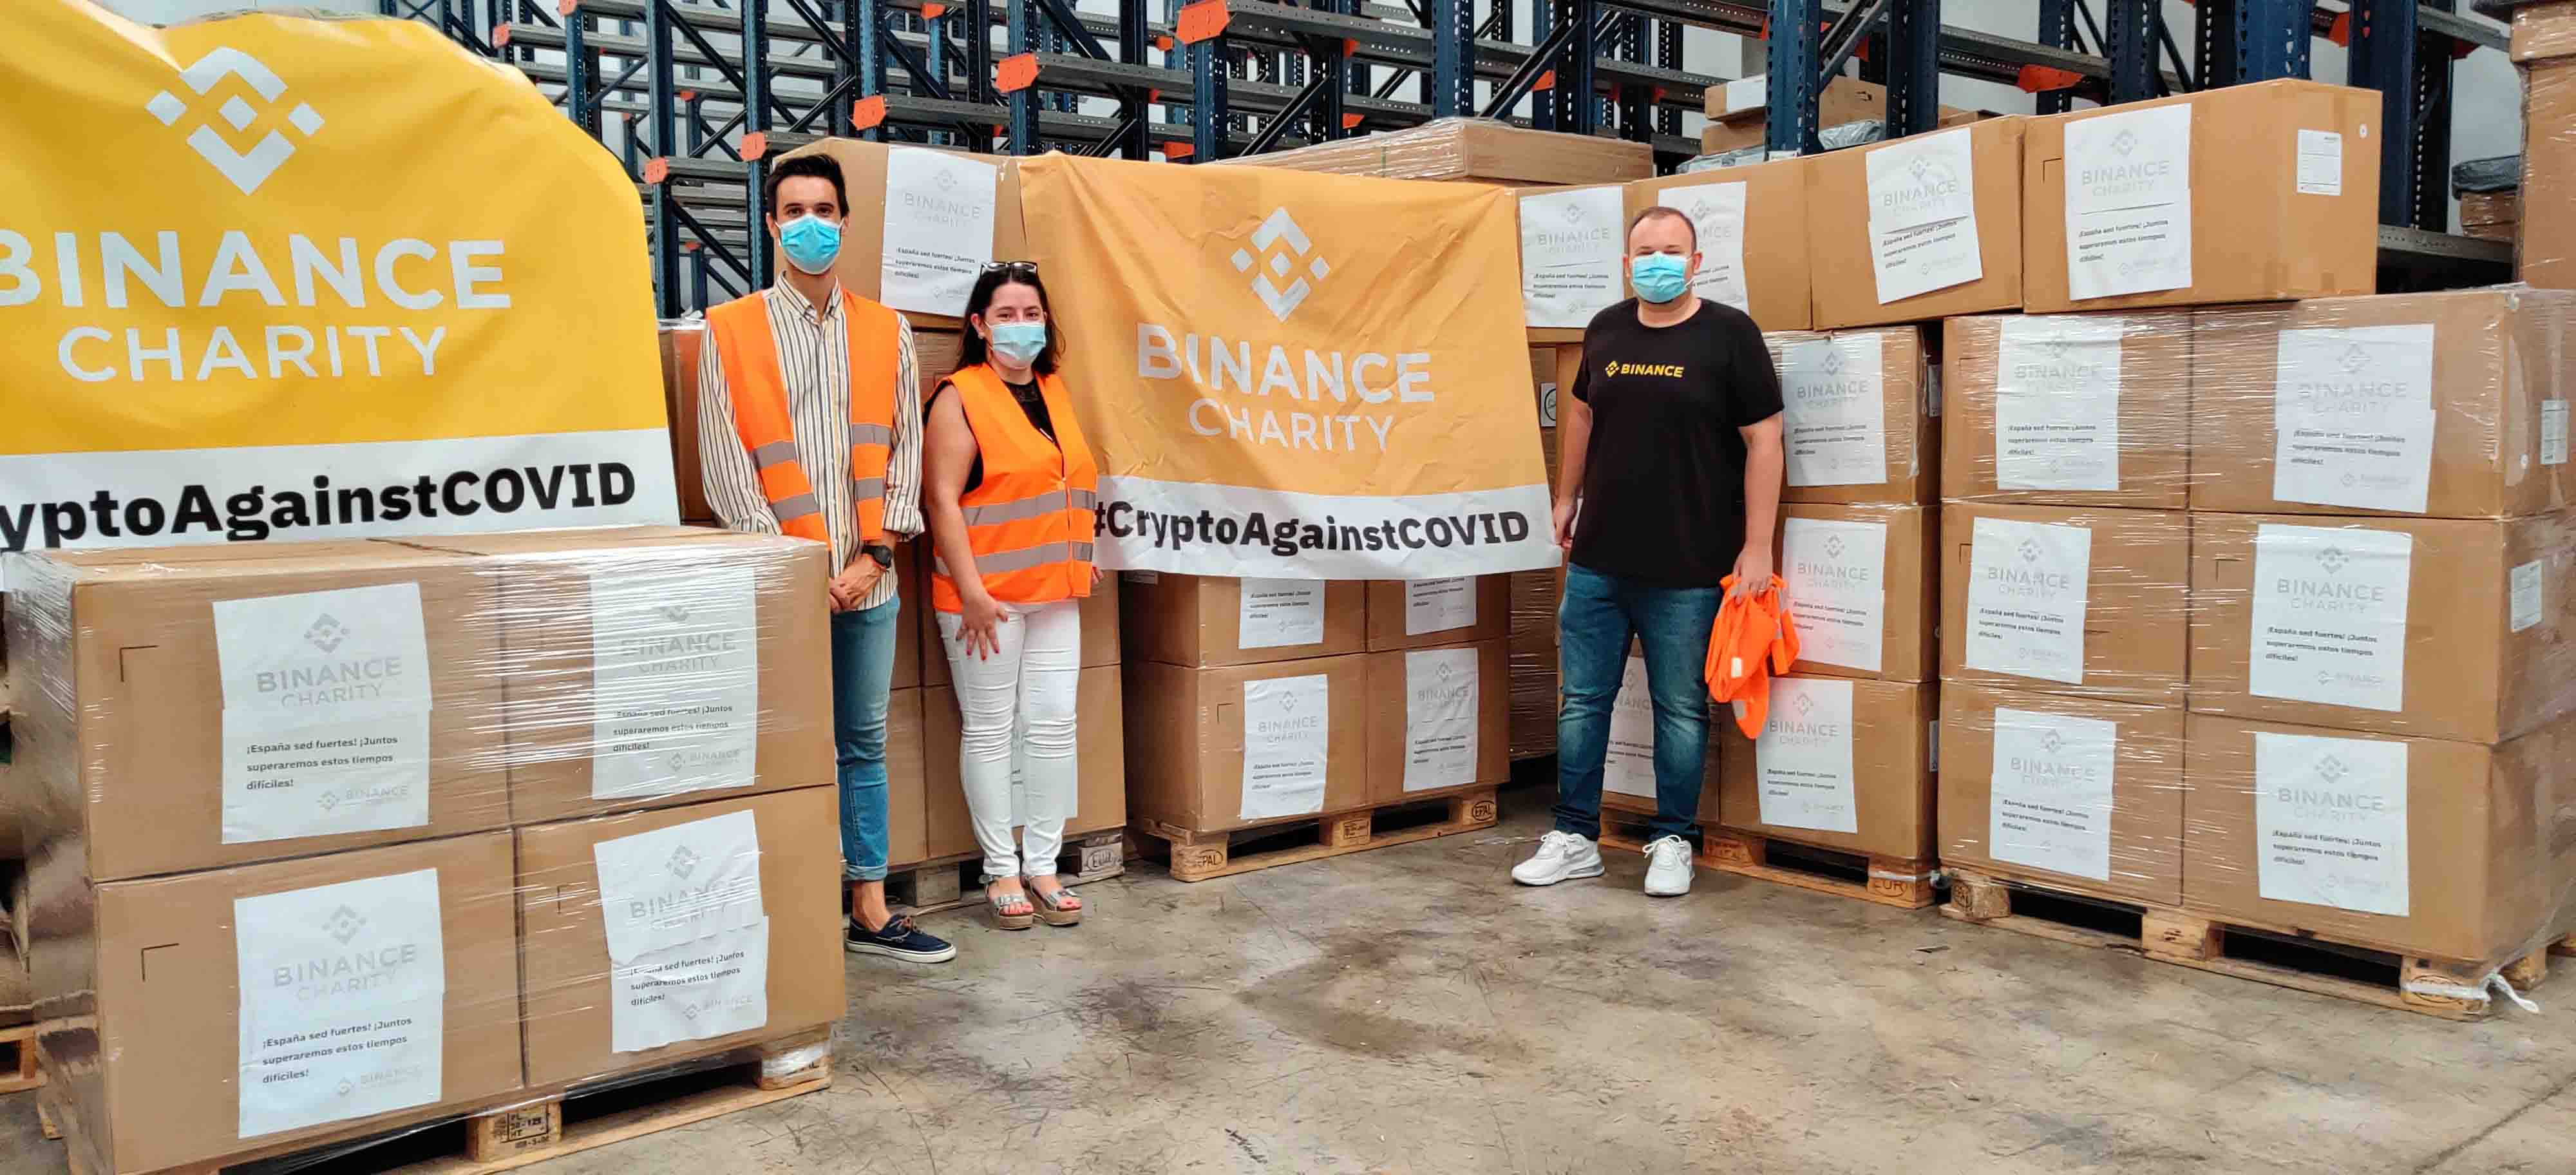 Binance-Charity.donaciones-espa{a-coronavirus-COVID-19